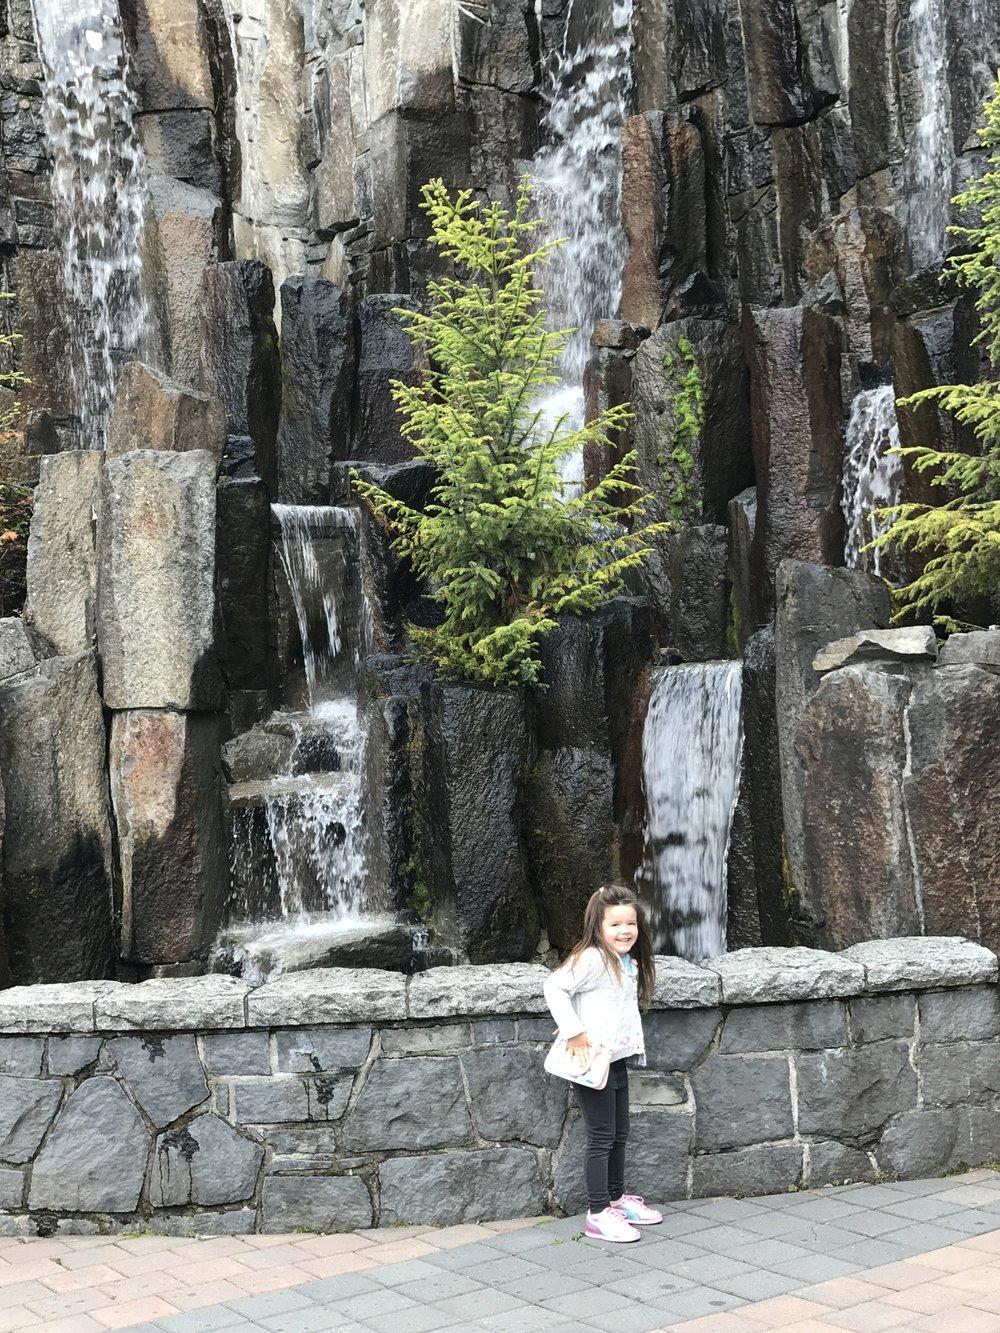 Chasing waterfalls at the Whistler Westin Resort and Spa